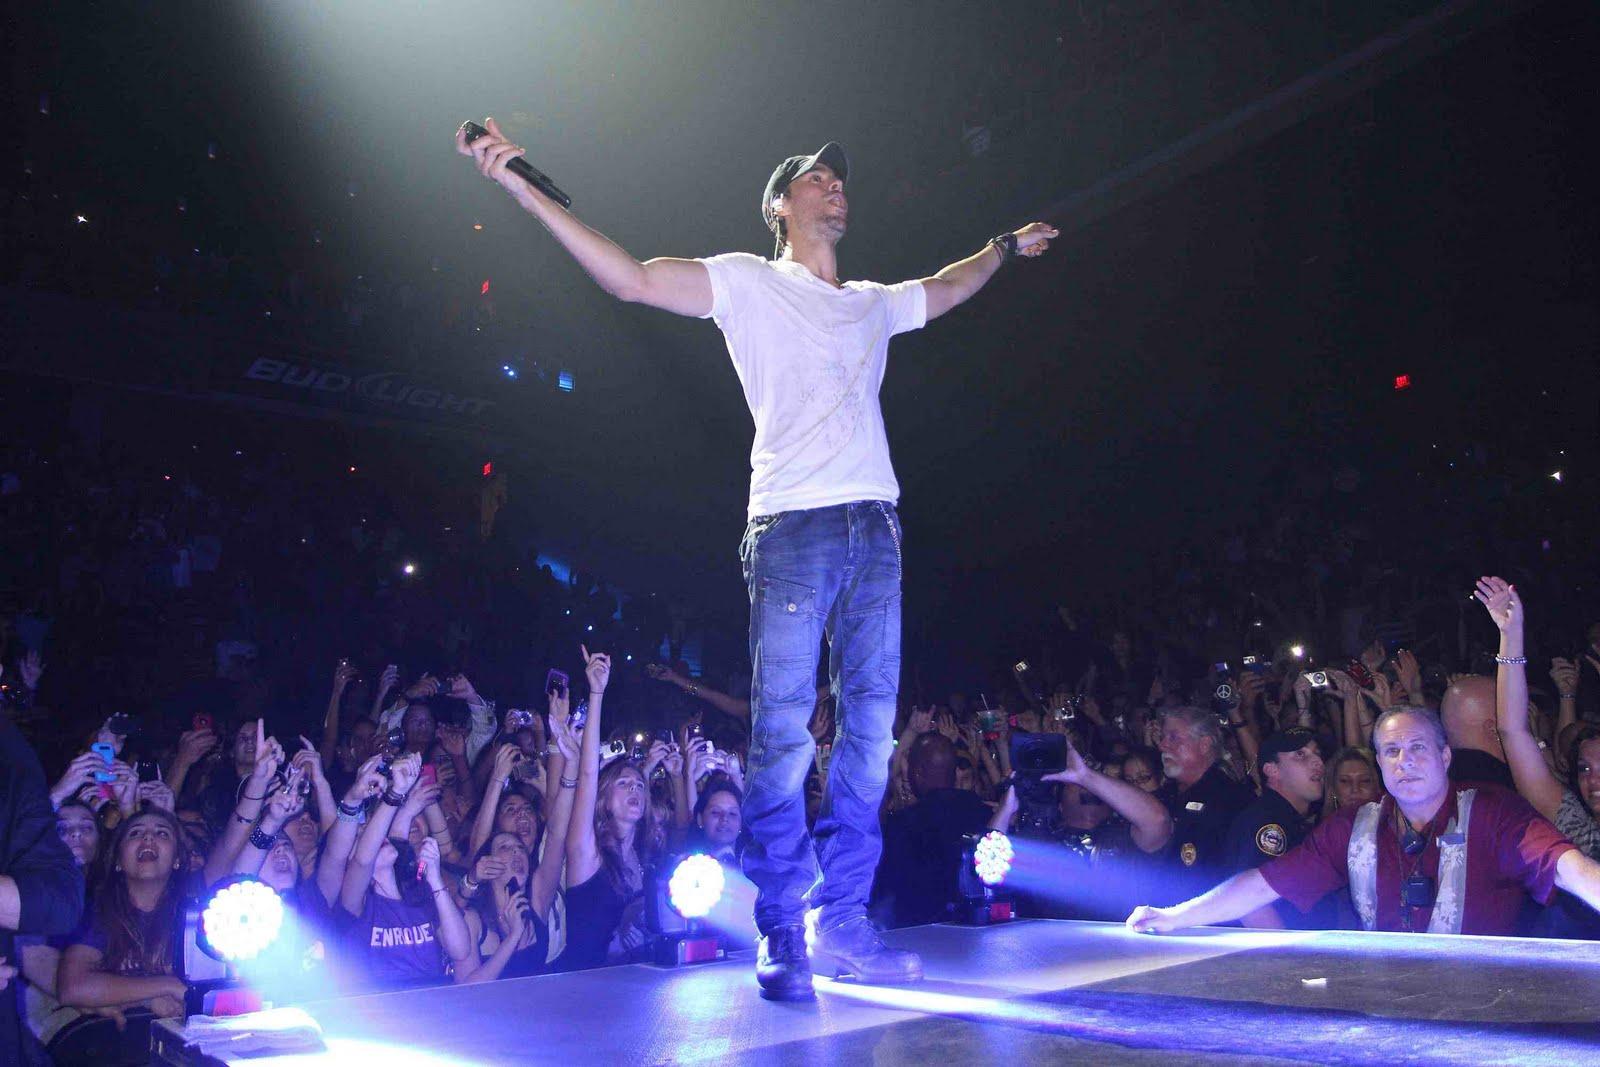 http://3.bp.blogspot.com/-DcJ_2QuwMws/Tk1n7jcZY5I/AAAAAAAAOUU/r6B9LGaItuk/s1600/Enrique_Iglesias_Concert_1.jpeg